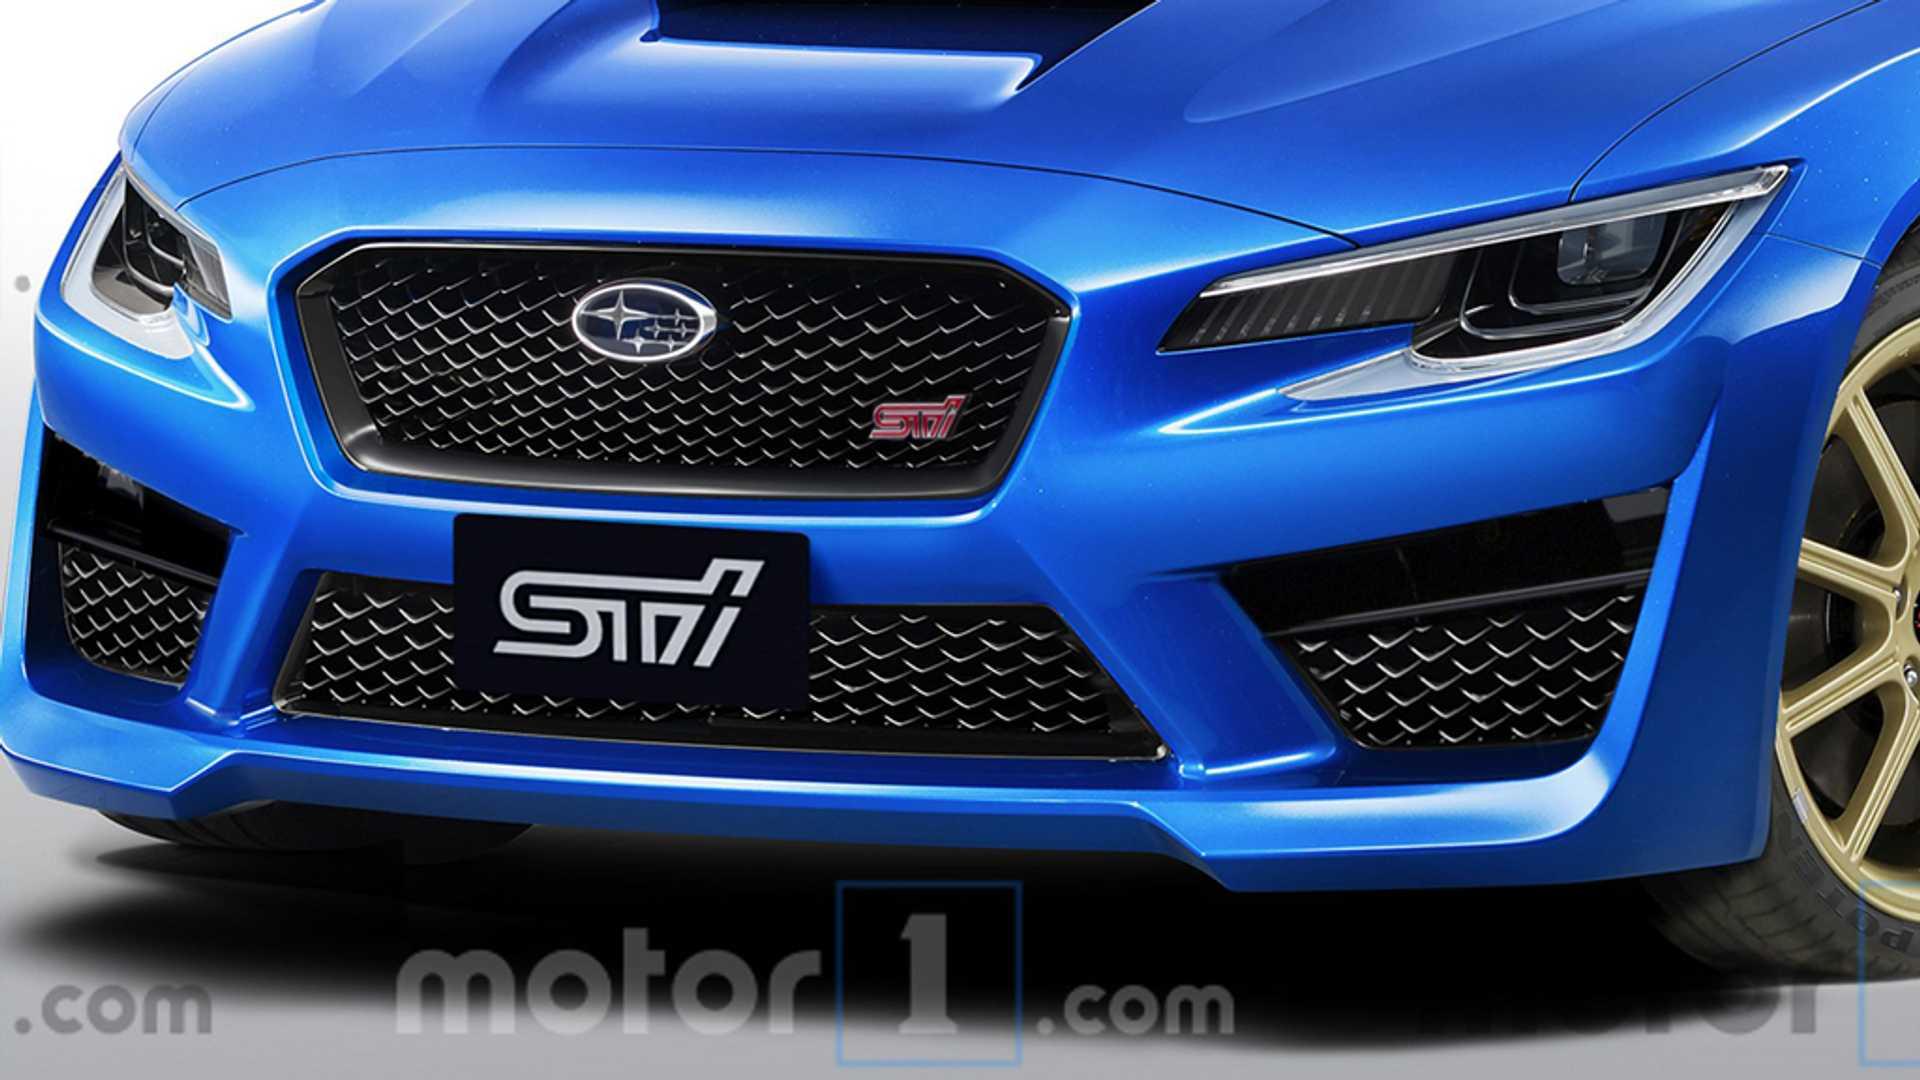 70 The Subaru Impreza Sti 2020 Interior for Subaru Impreza Sti 2020